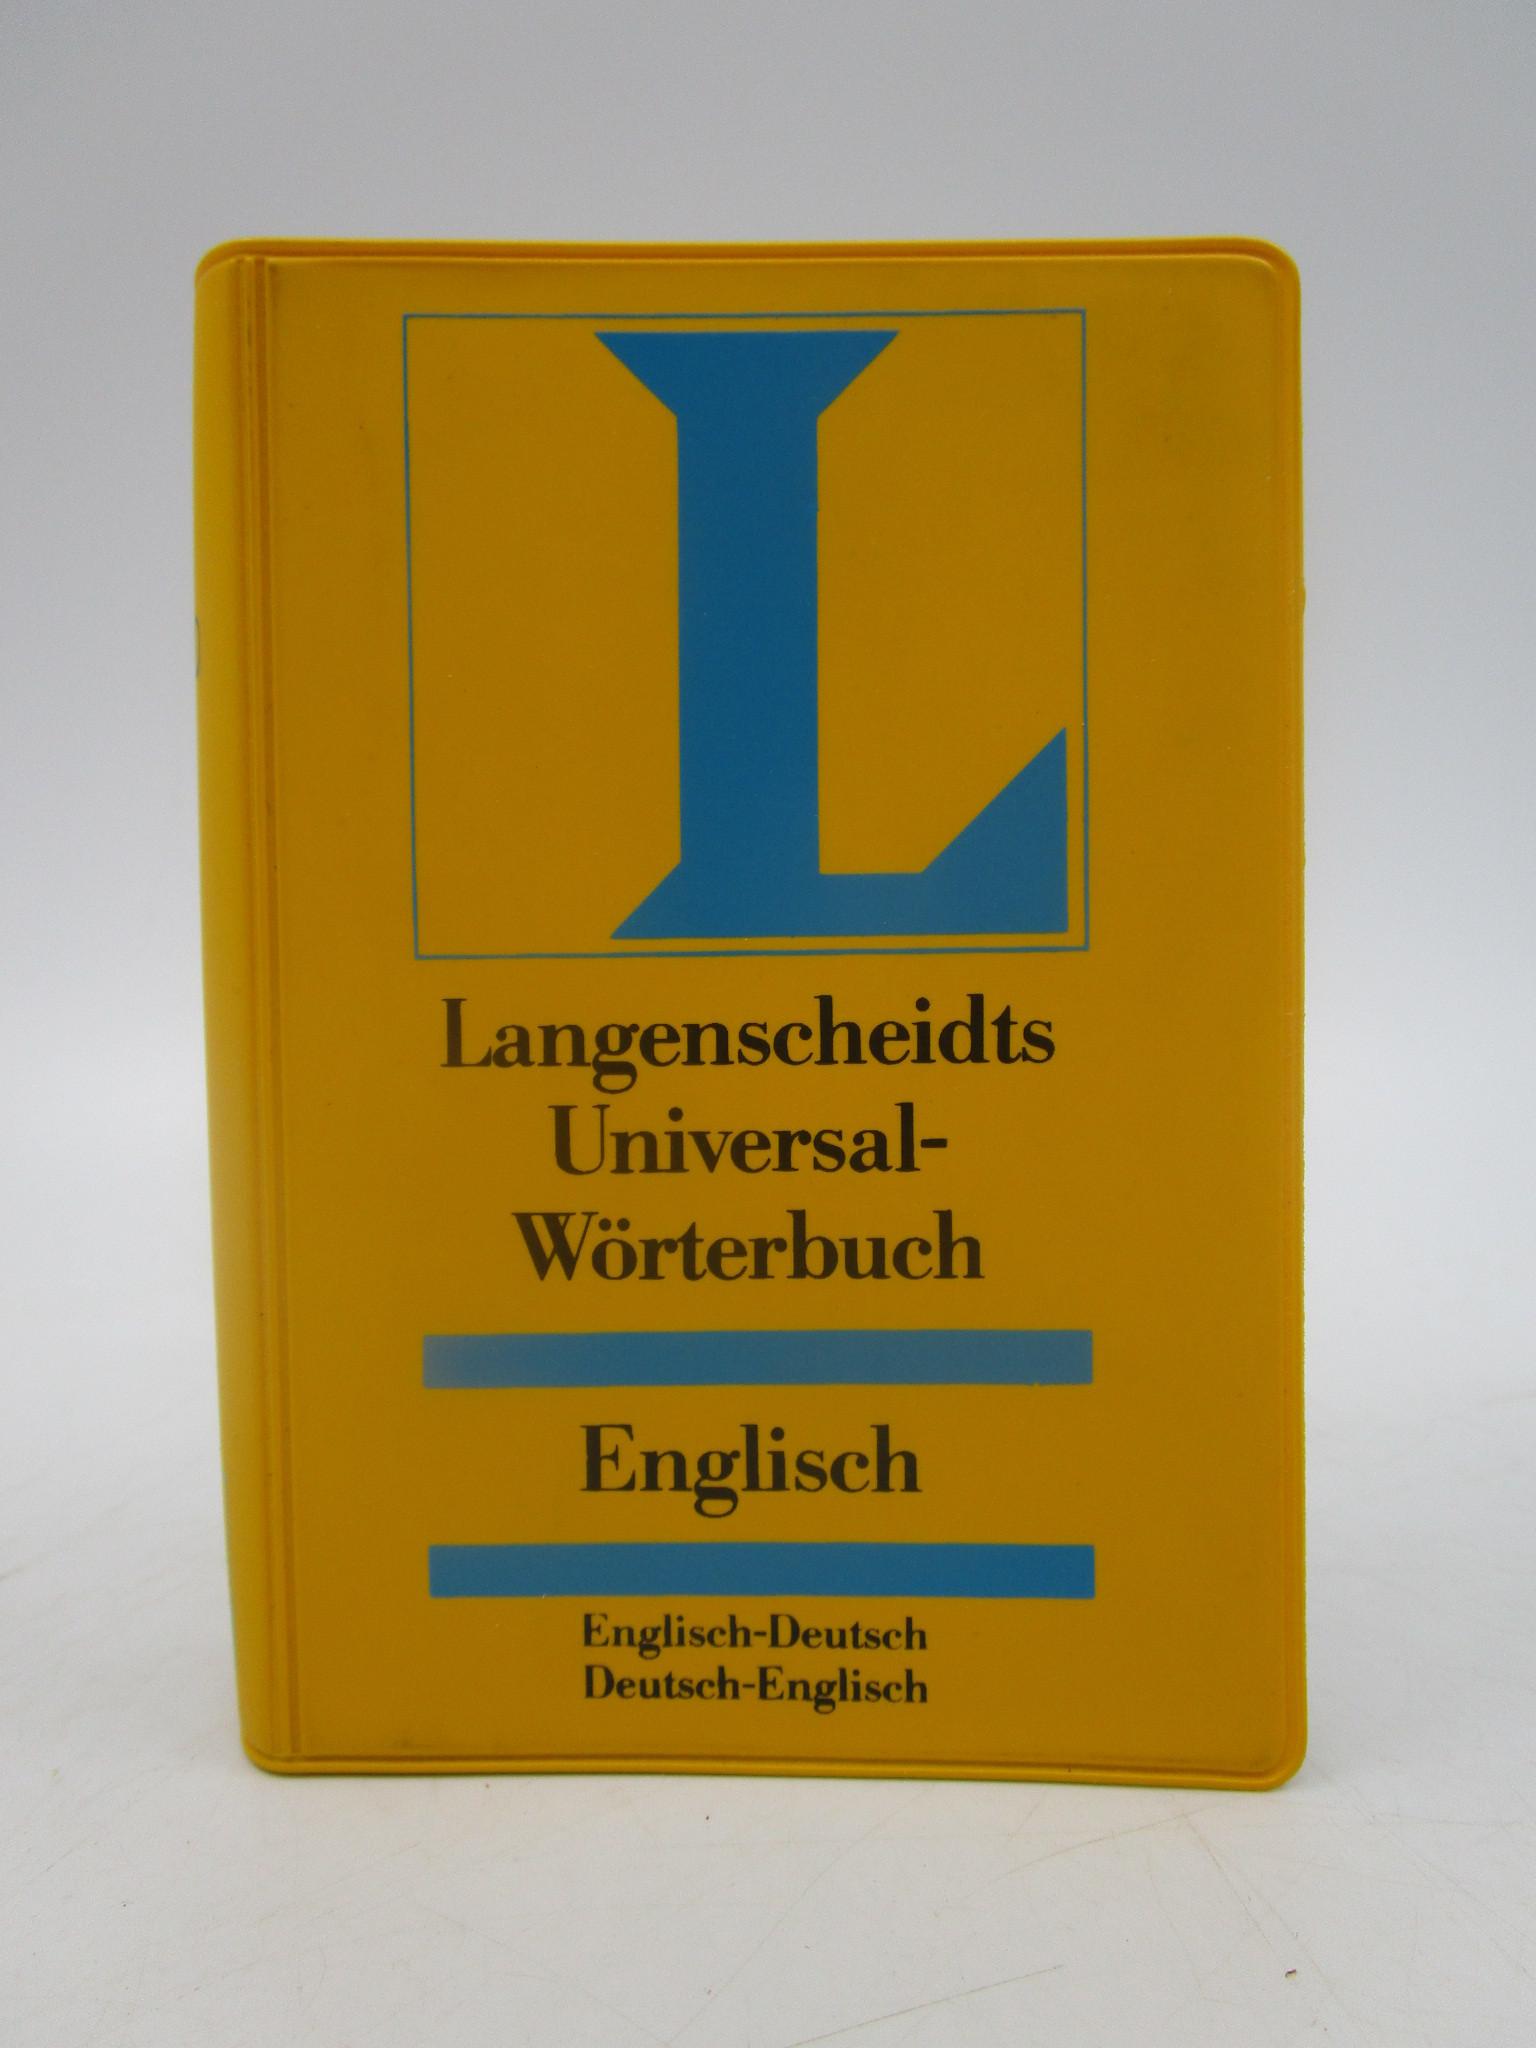 Image for Langenscheidts Universal-Wrterbuch Englisch. Englisch-Deutsch, Deutsch-Englisch